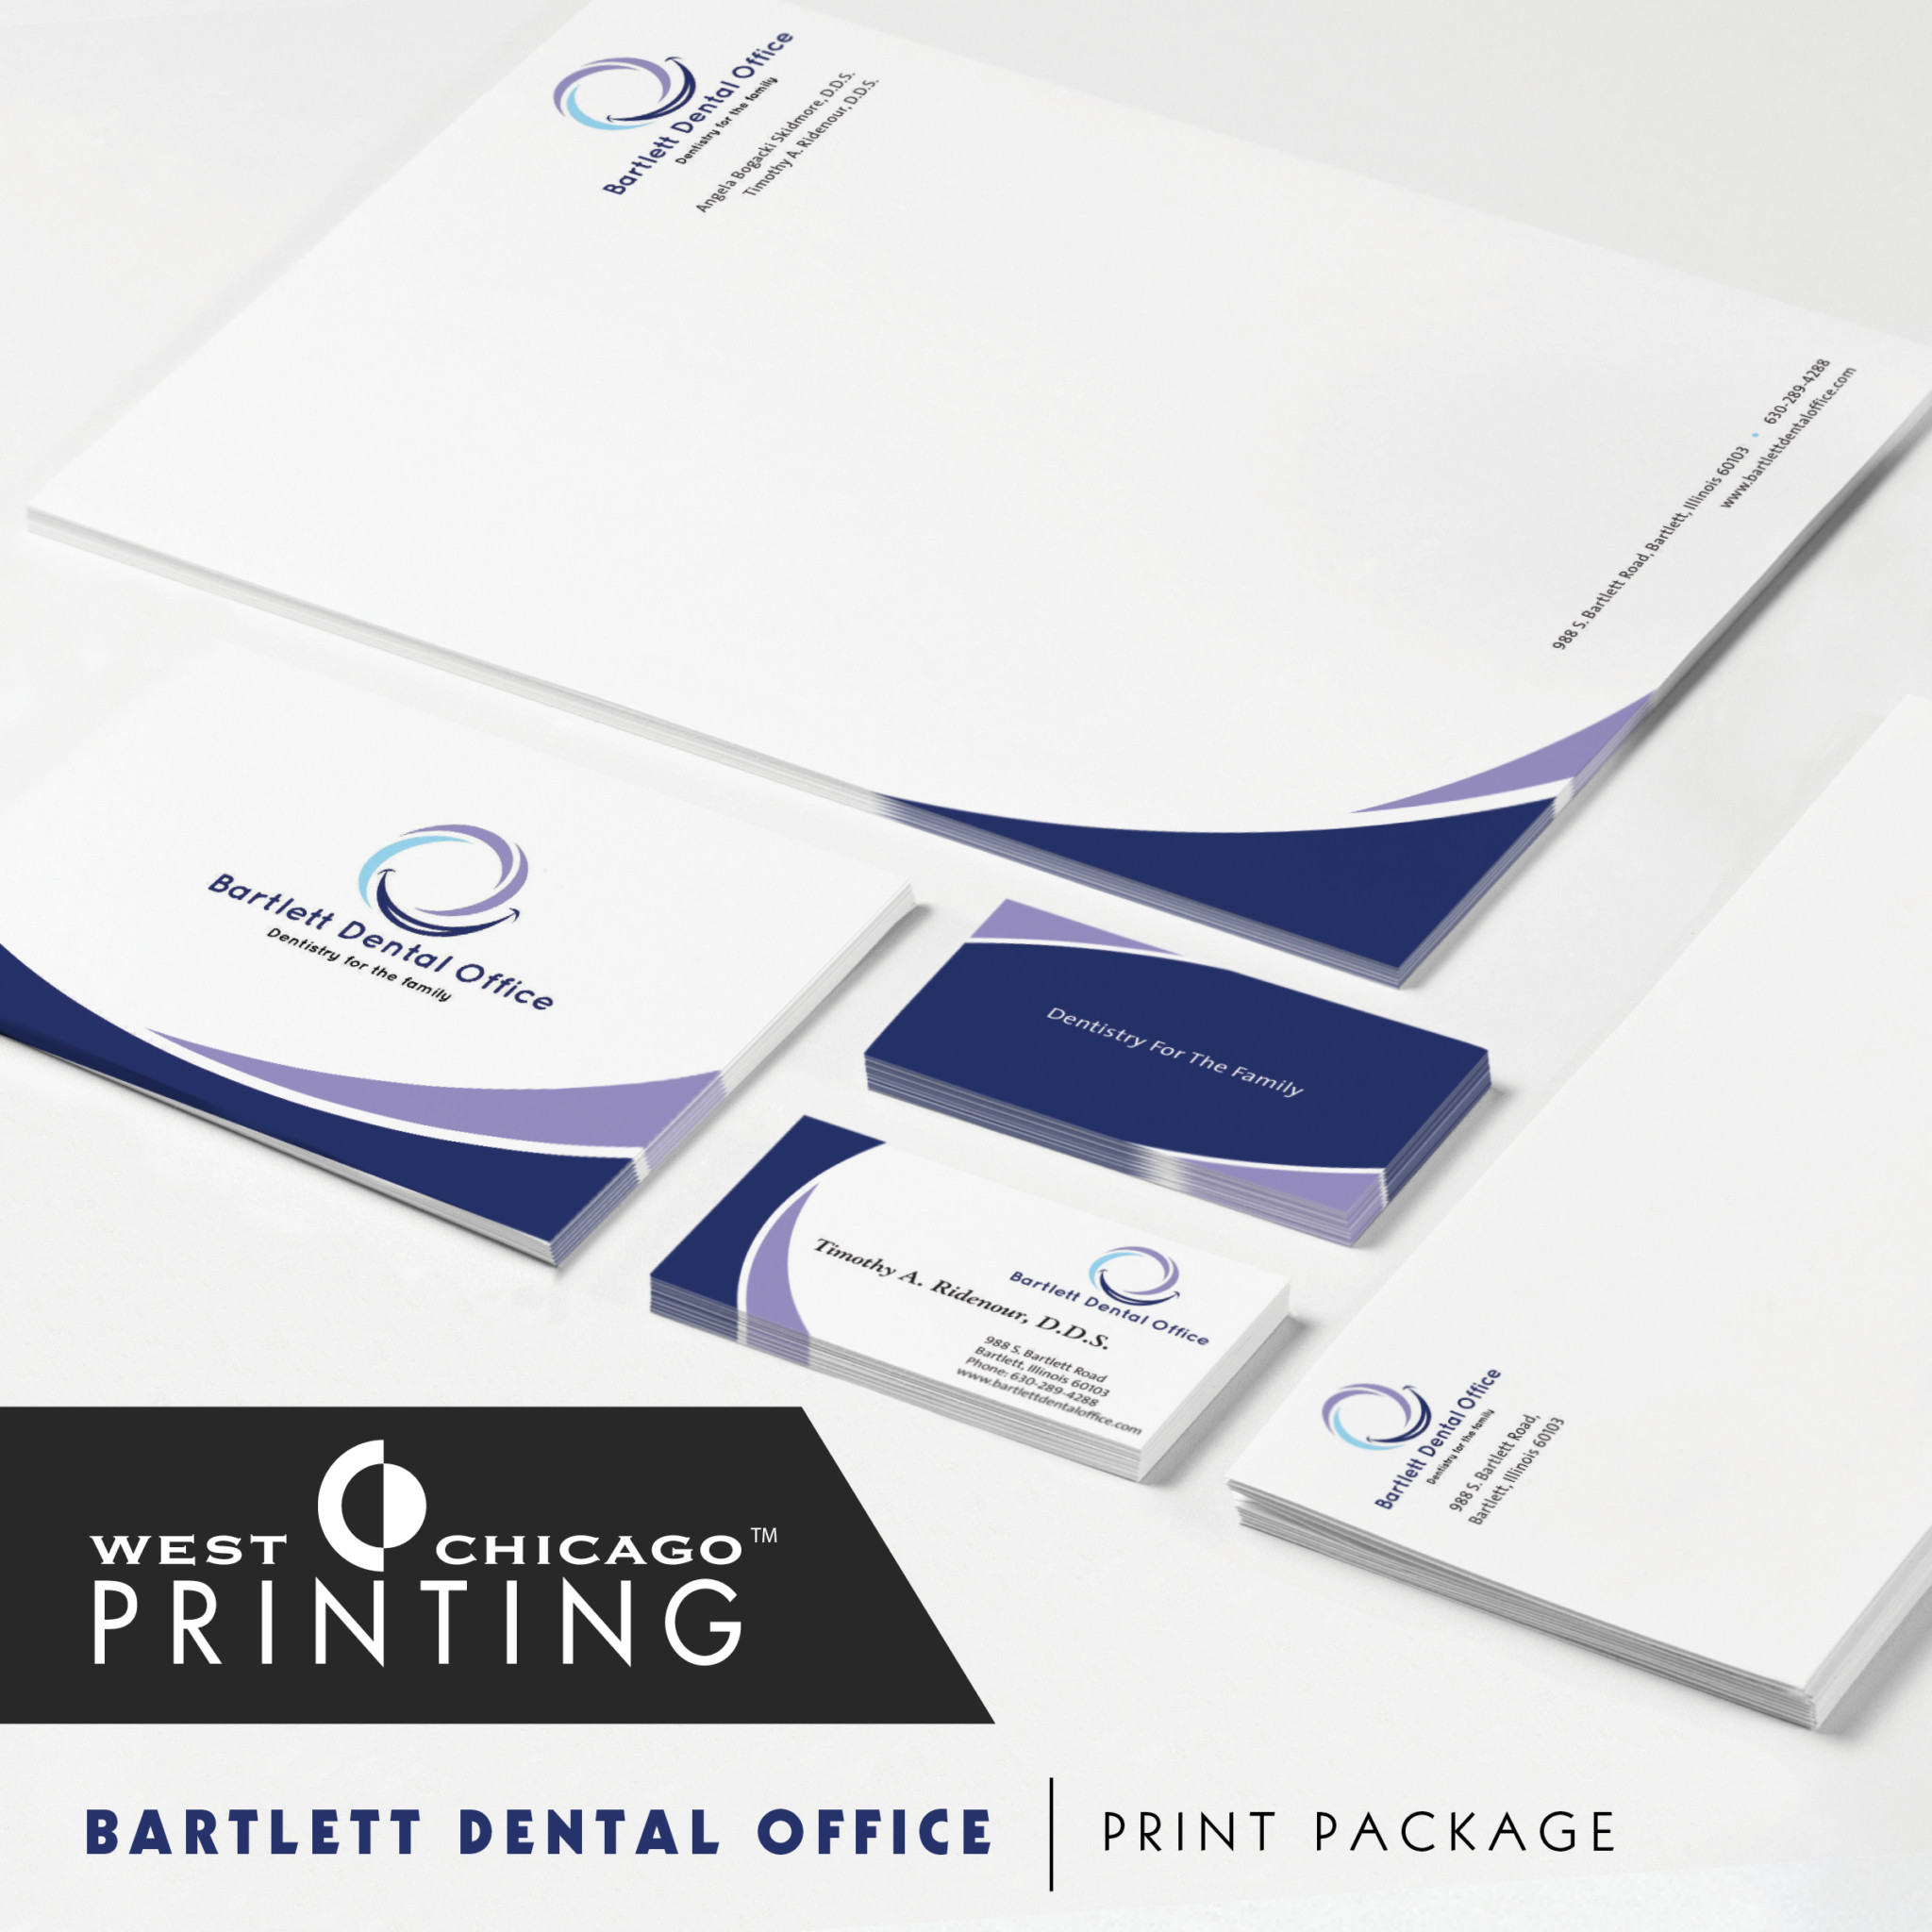 Bartlett Dental Office Print Package